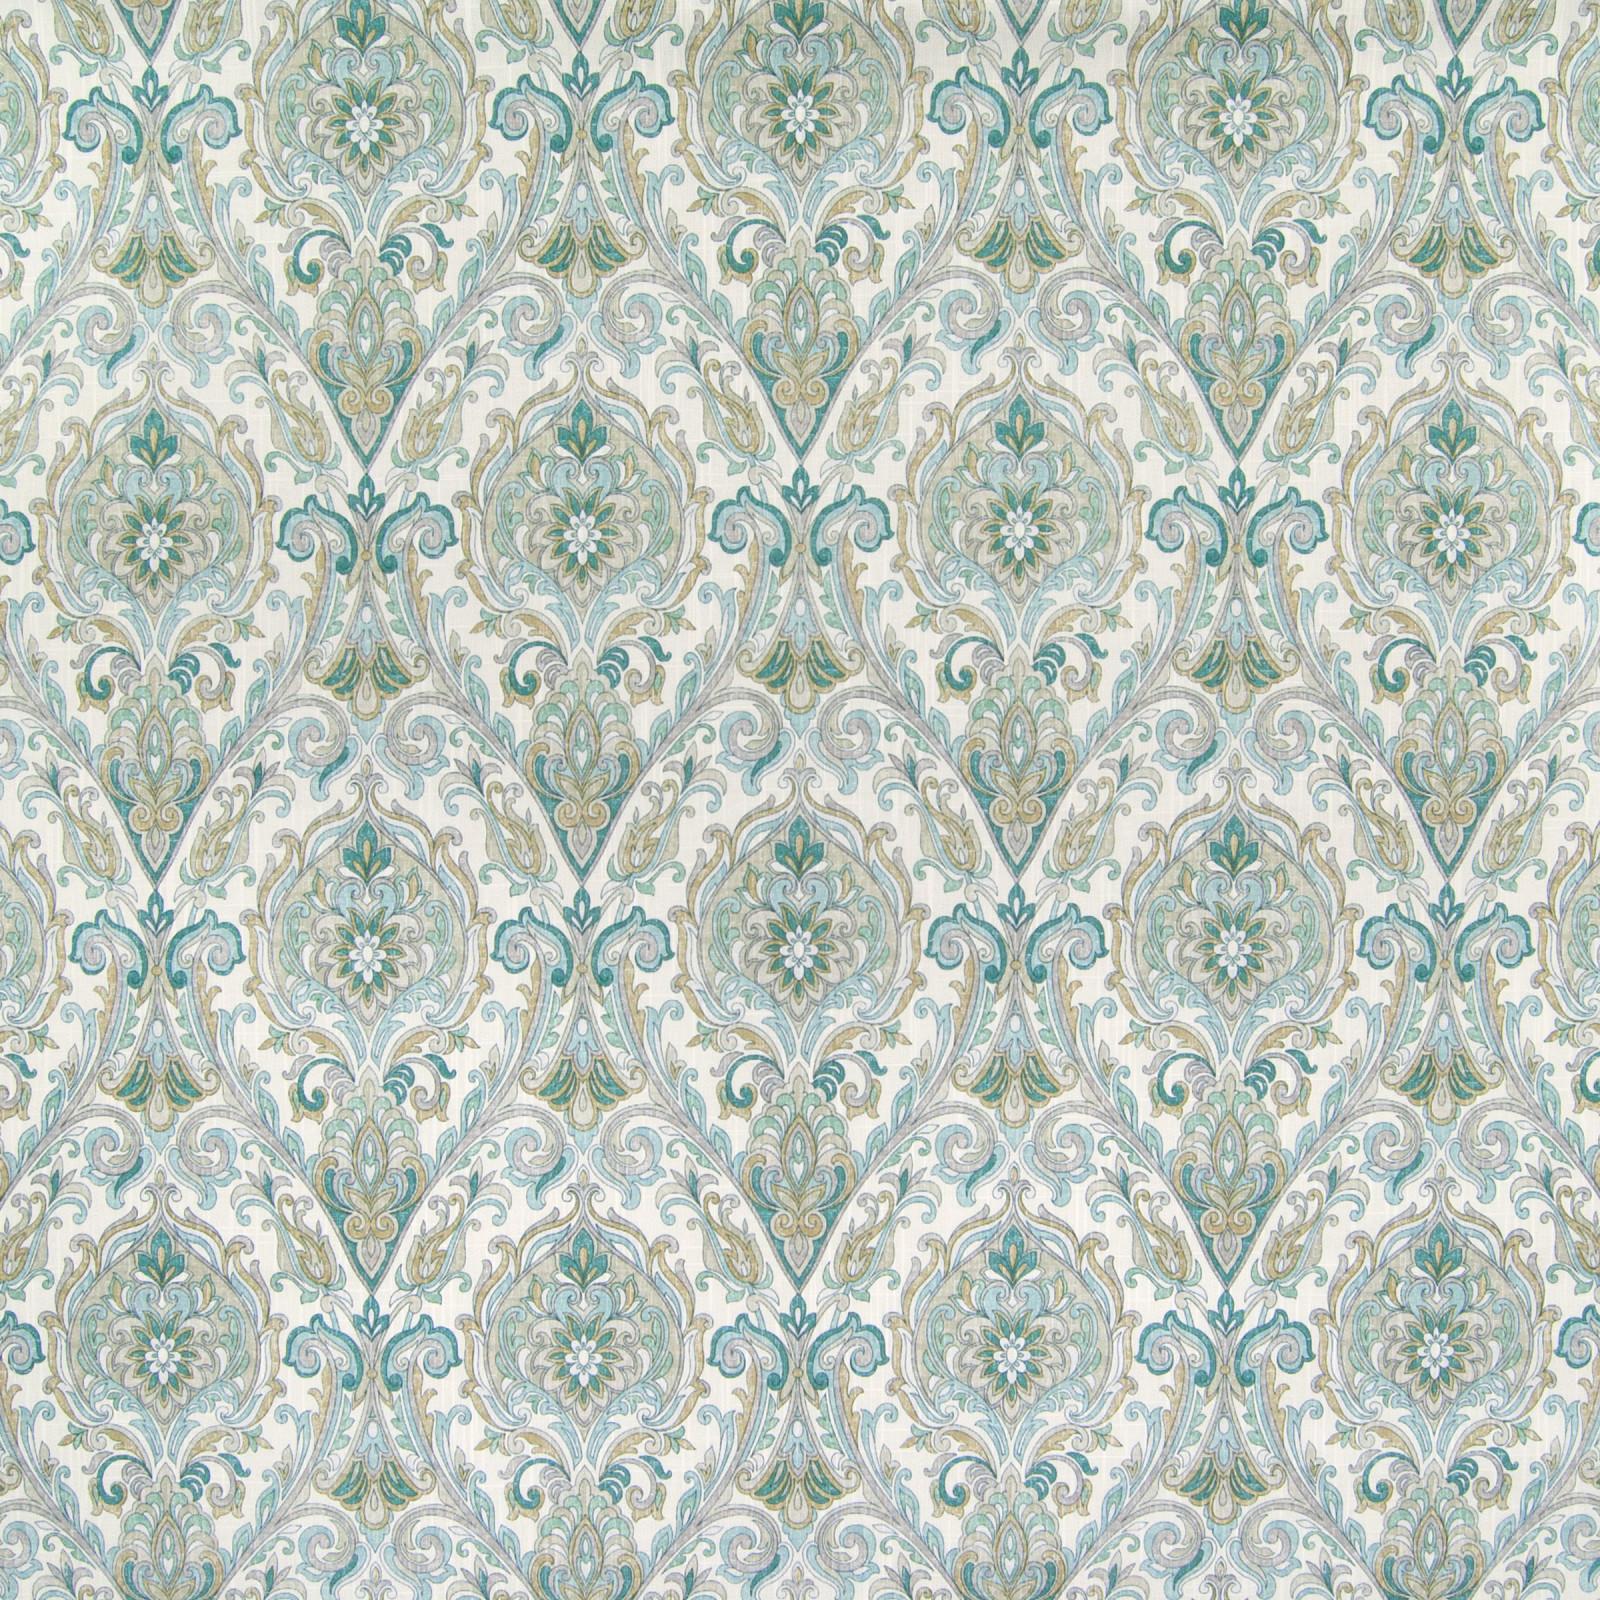 B6501 Jadestone Fabric D69 D71 TEAL MEDALLION MEDIUM SCALE PRINT